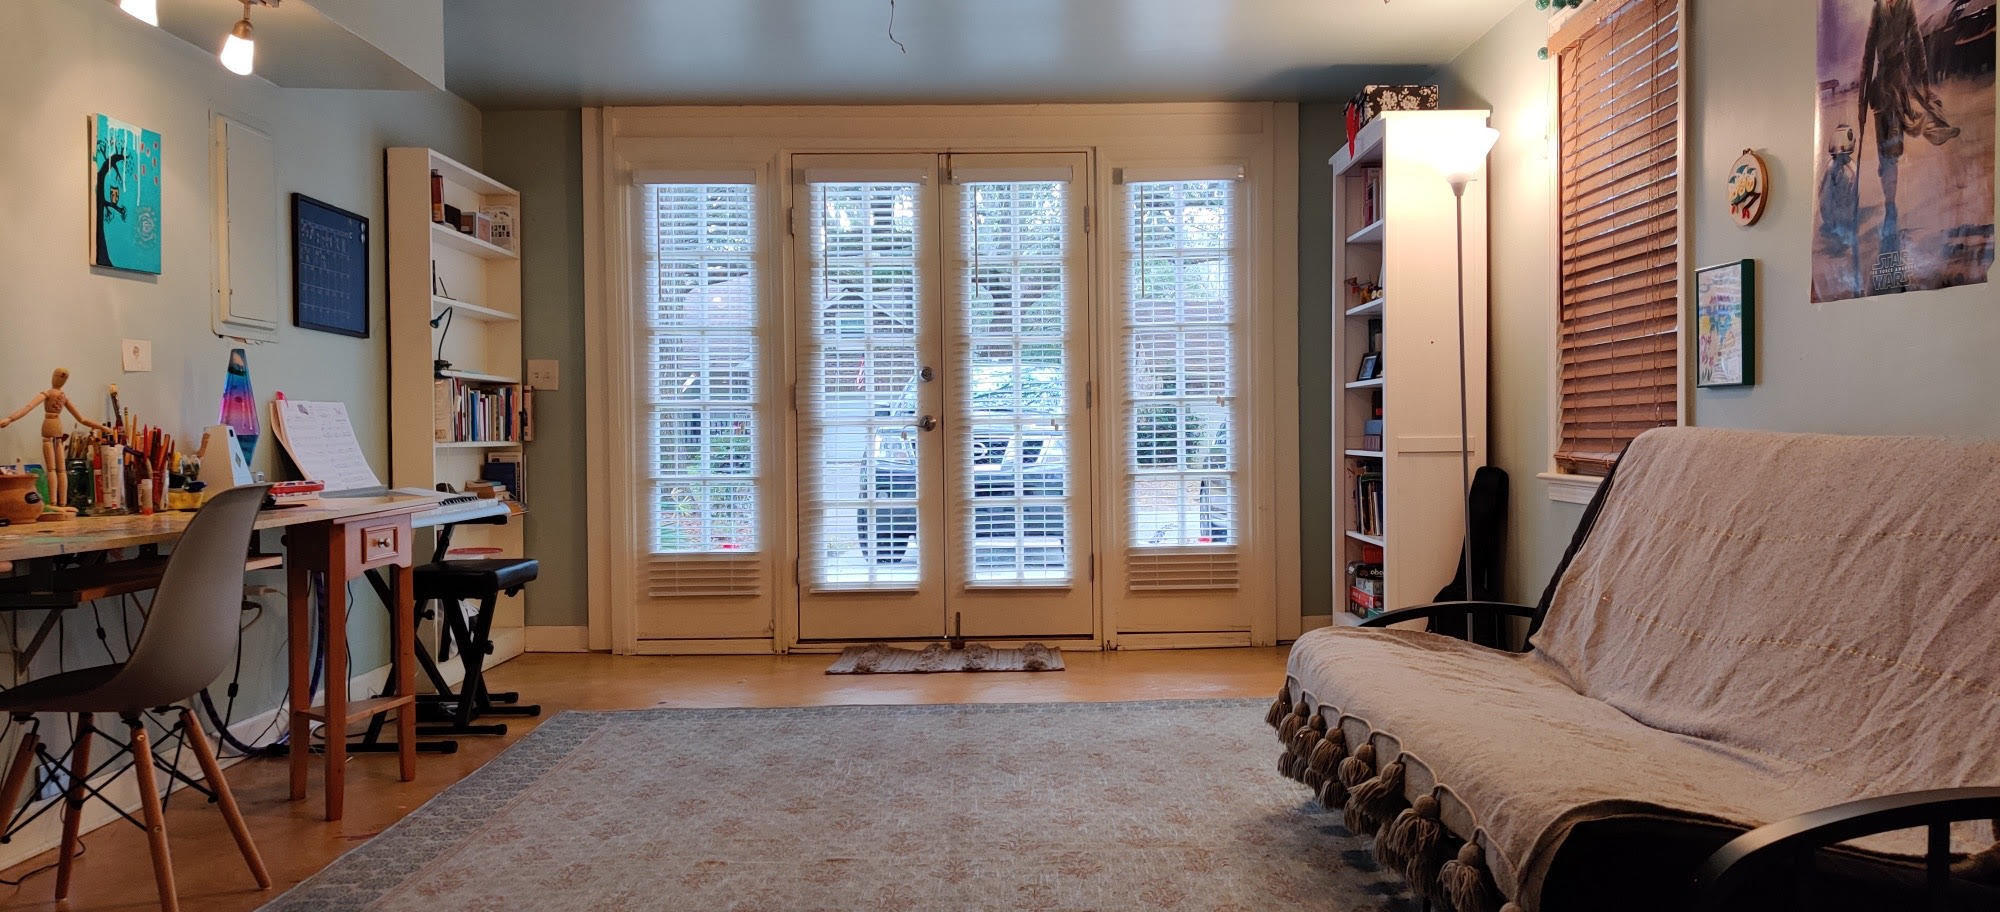 Shemwood II Homes For Sale - 950 Sea Gull, Mount Pleasant, SC - 4